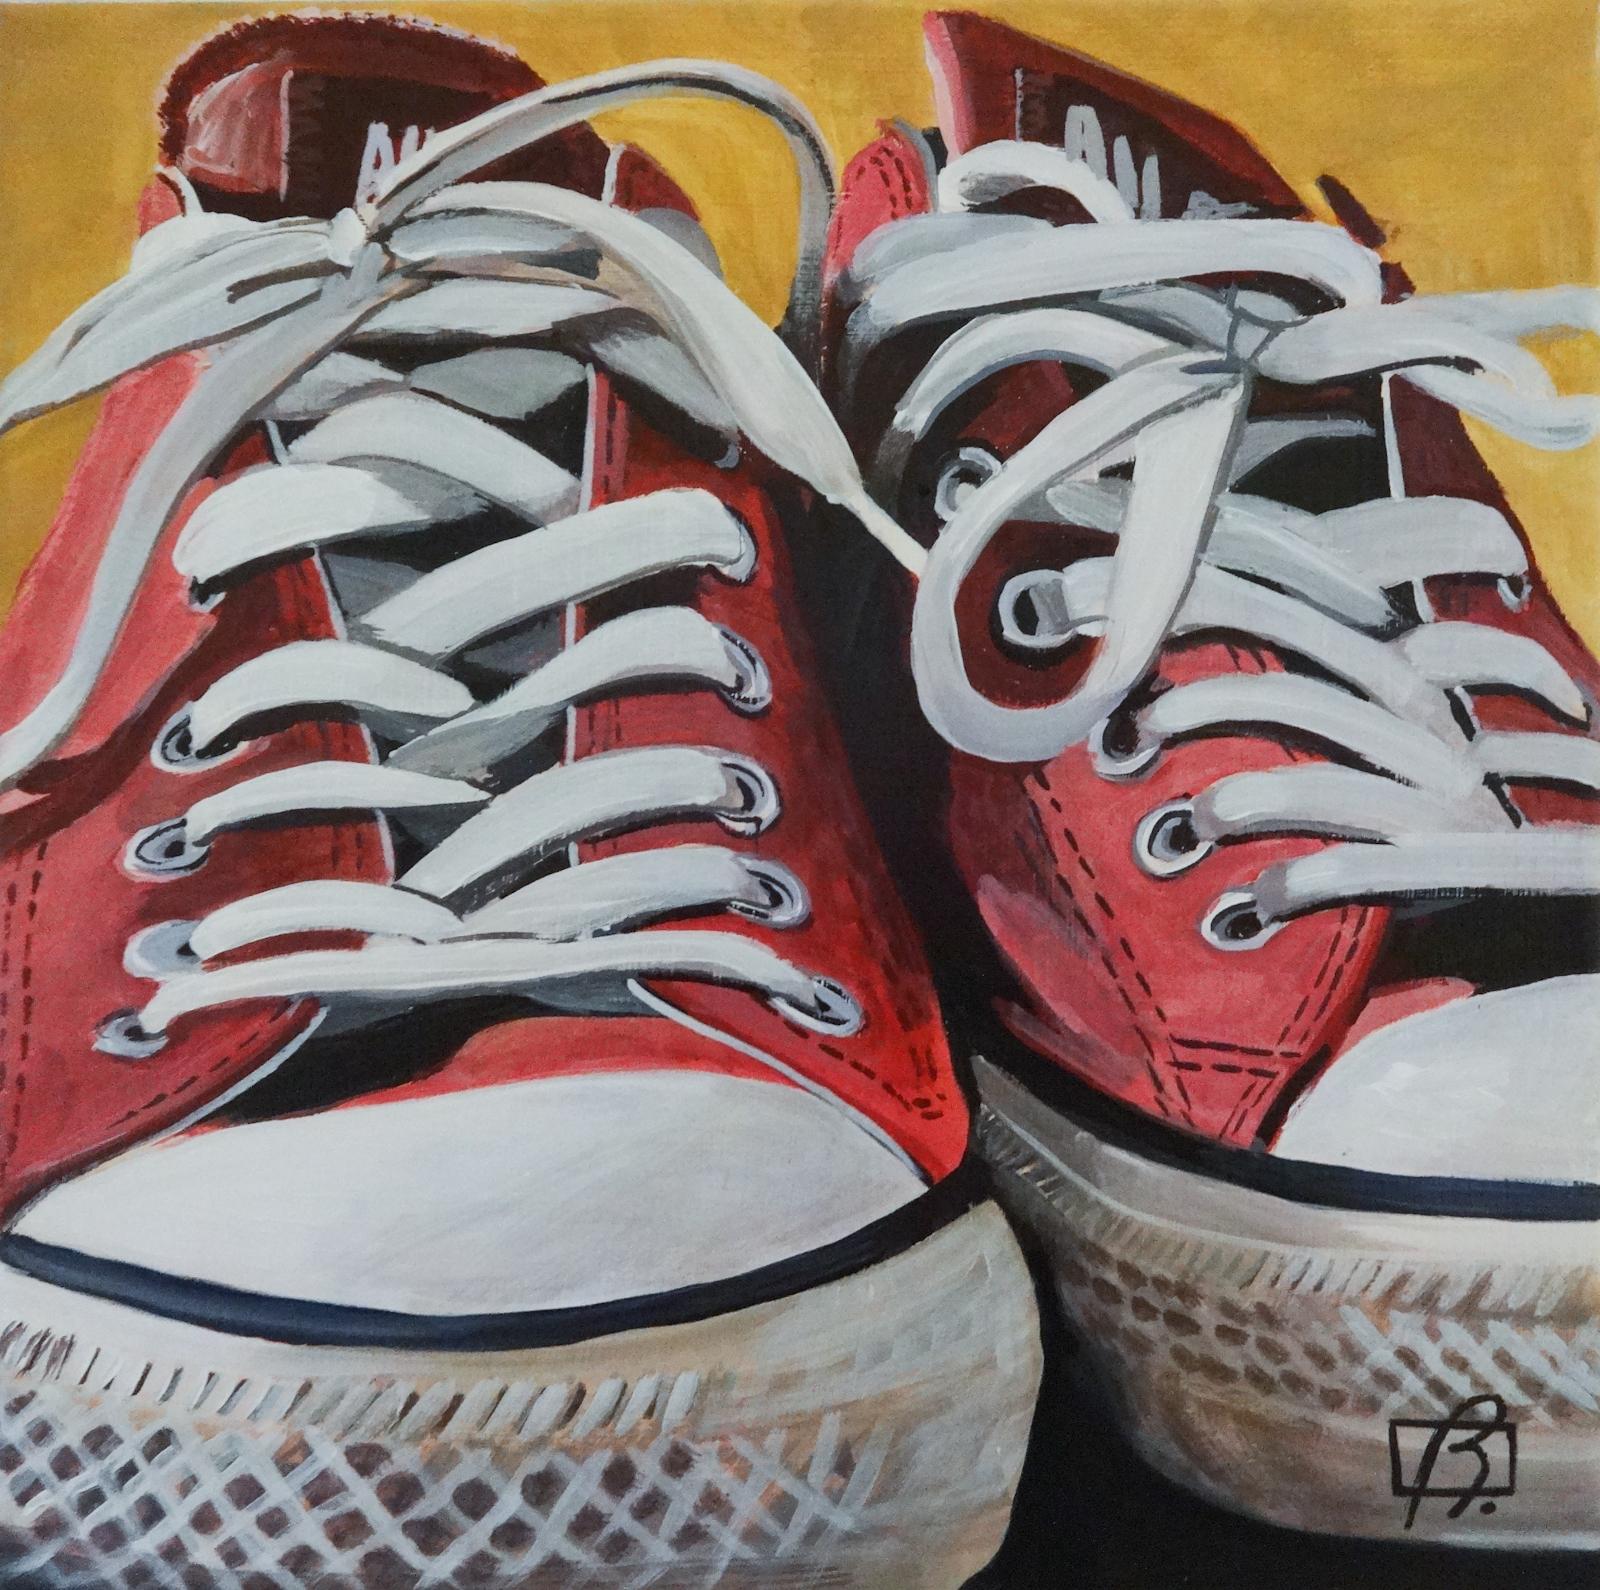 994cf7d0a1f8 Orange Converse . (c) 2015 . Andre Beaulieu